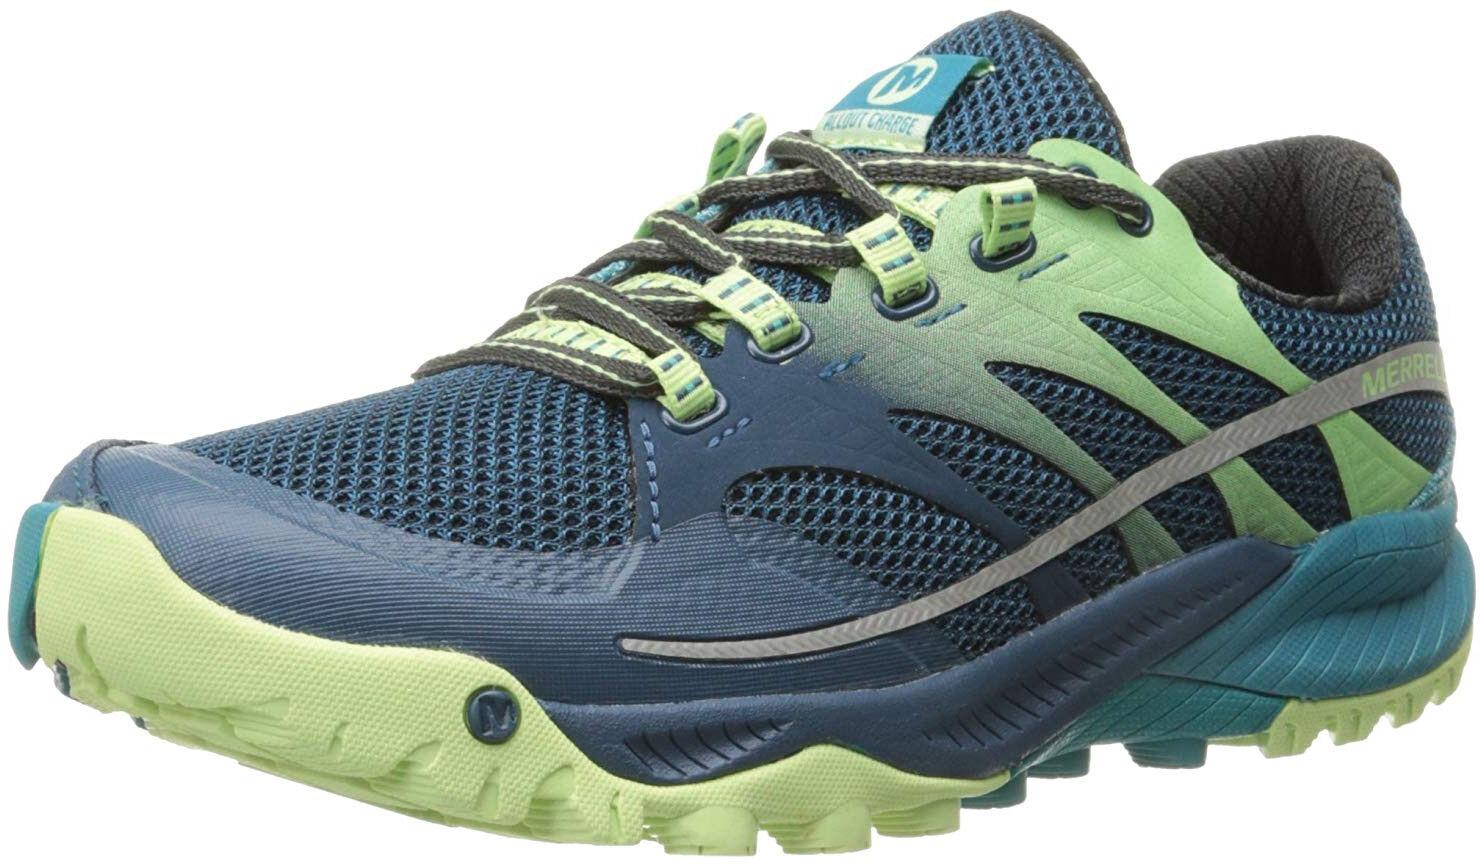 Merrell All Out Charge damen Trail Running schuhe - Blau